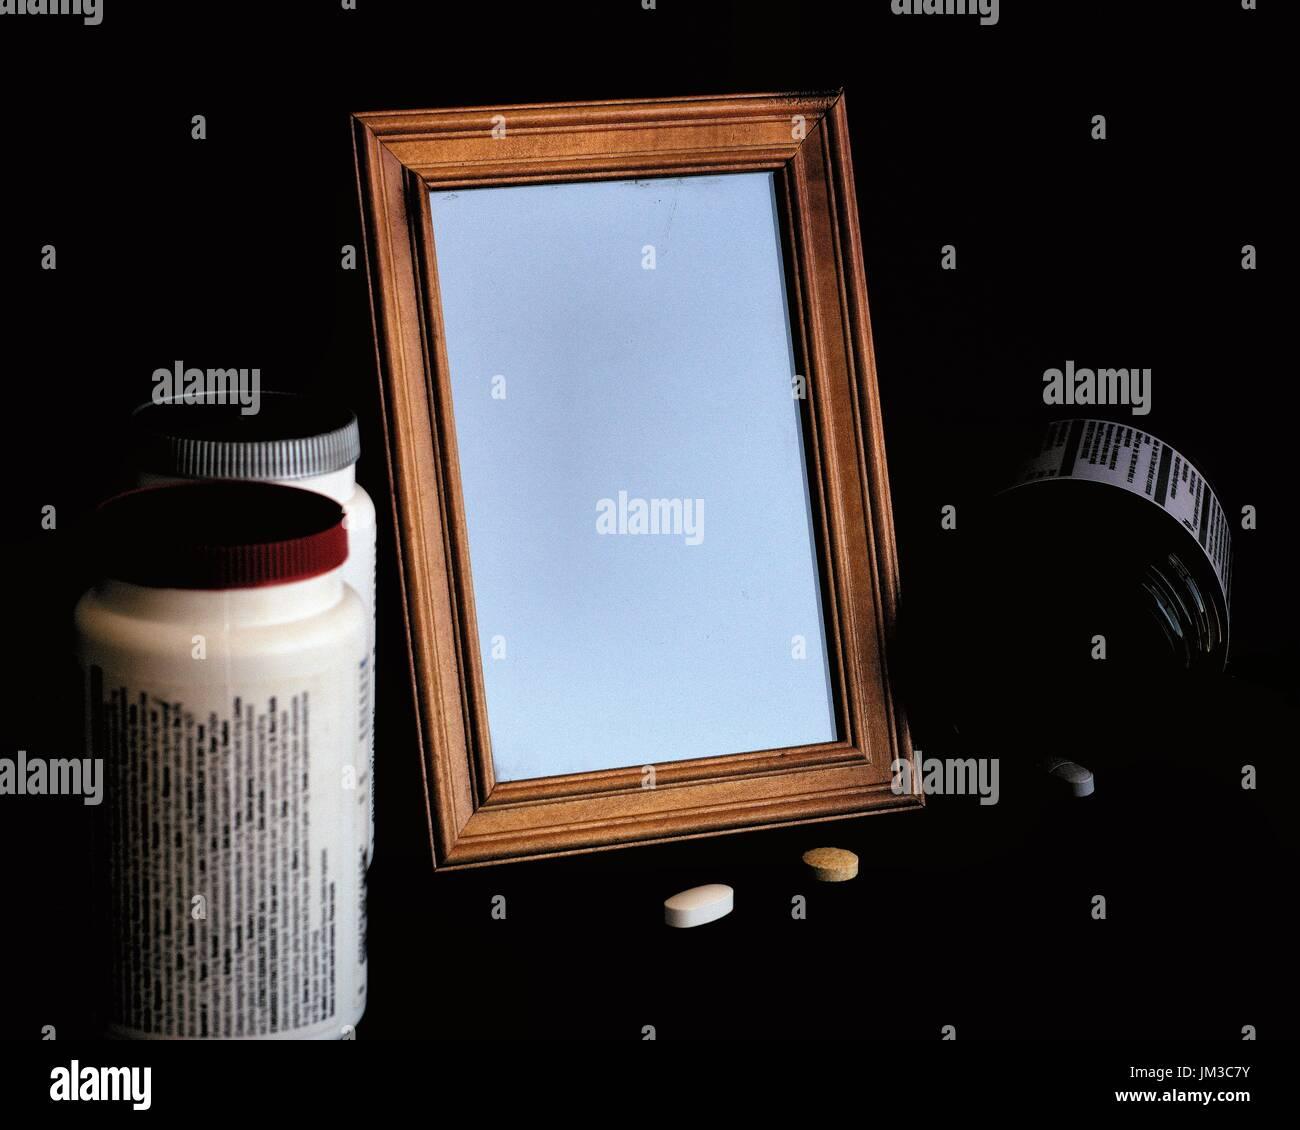 Drug Industry Stockfotos & Drug Industry Bilder - Alamy